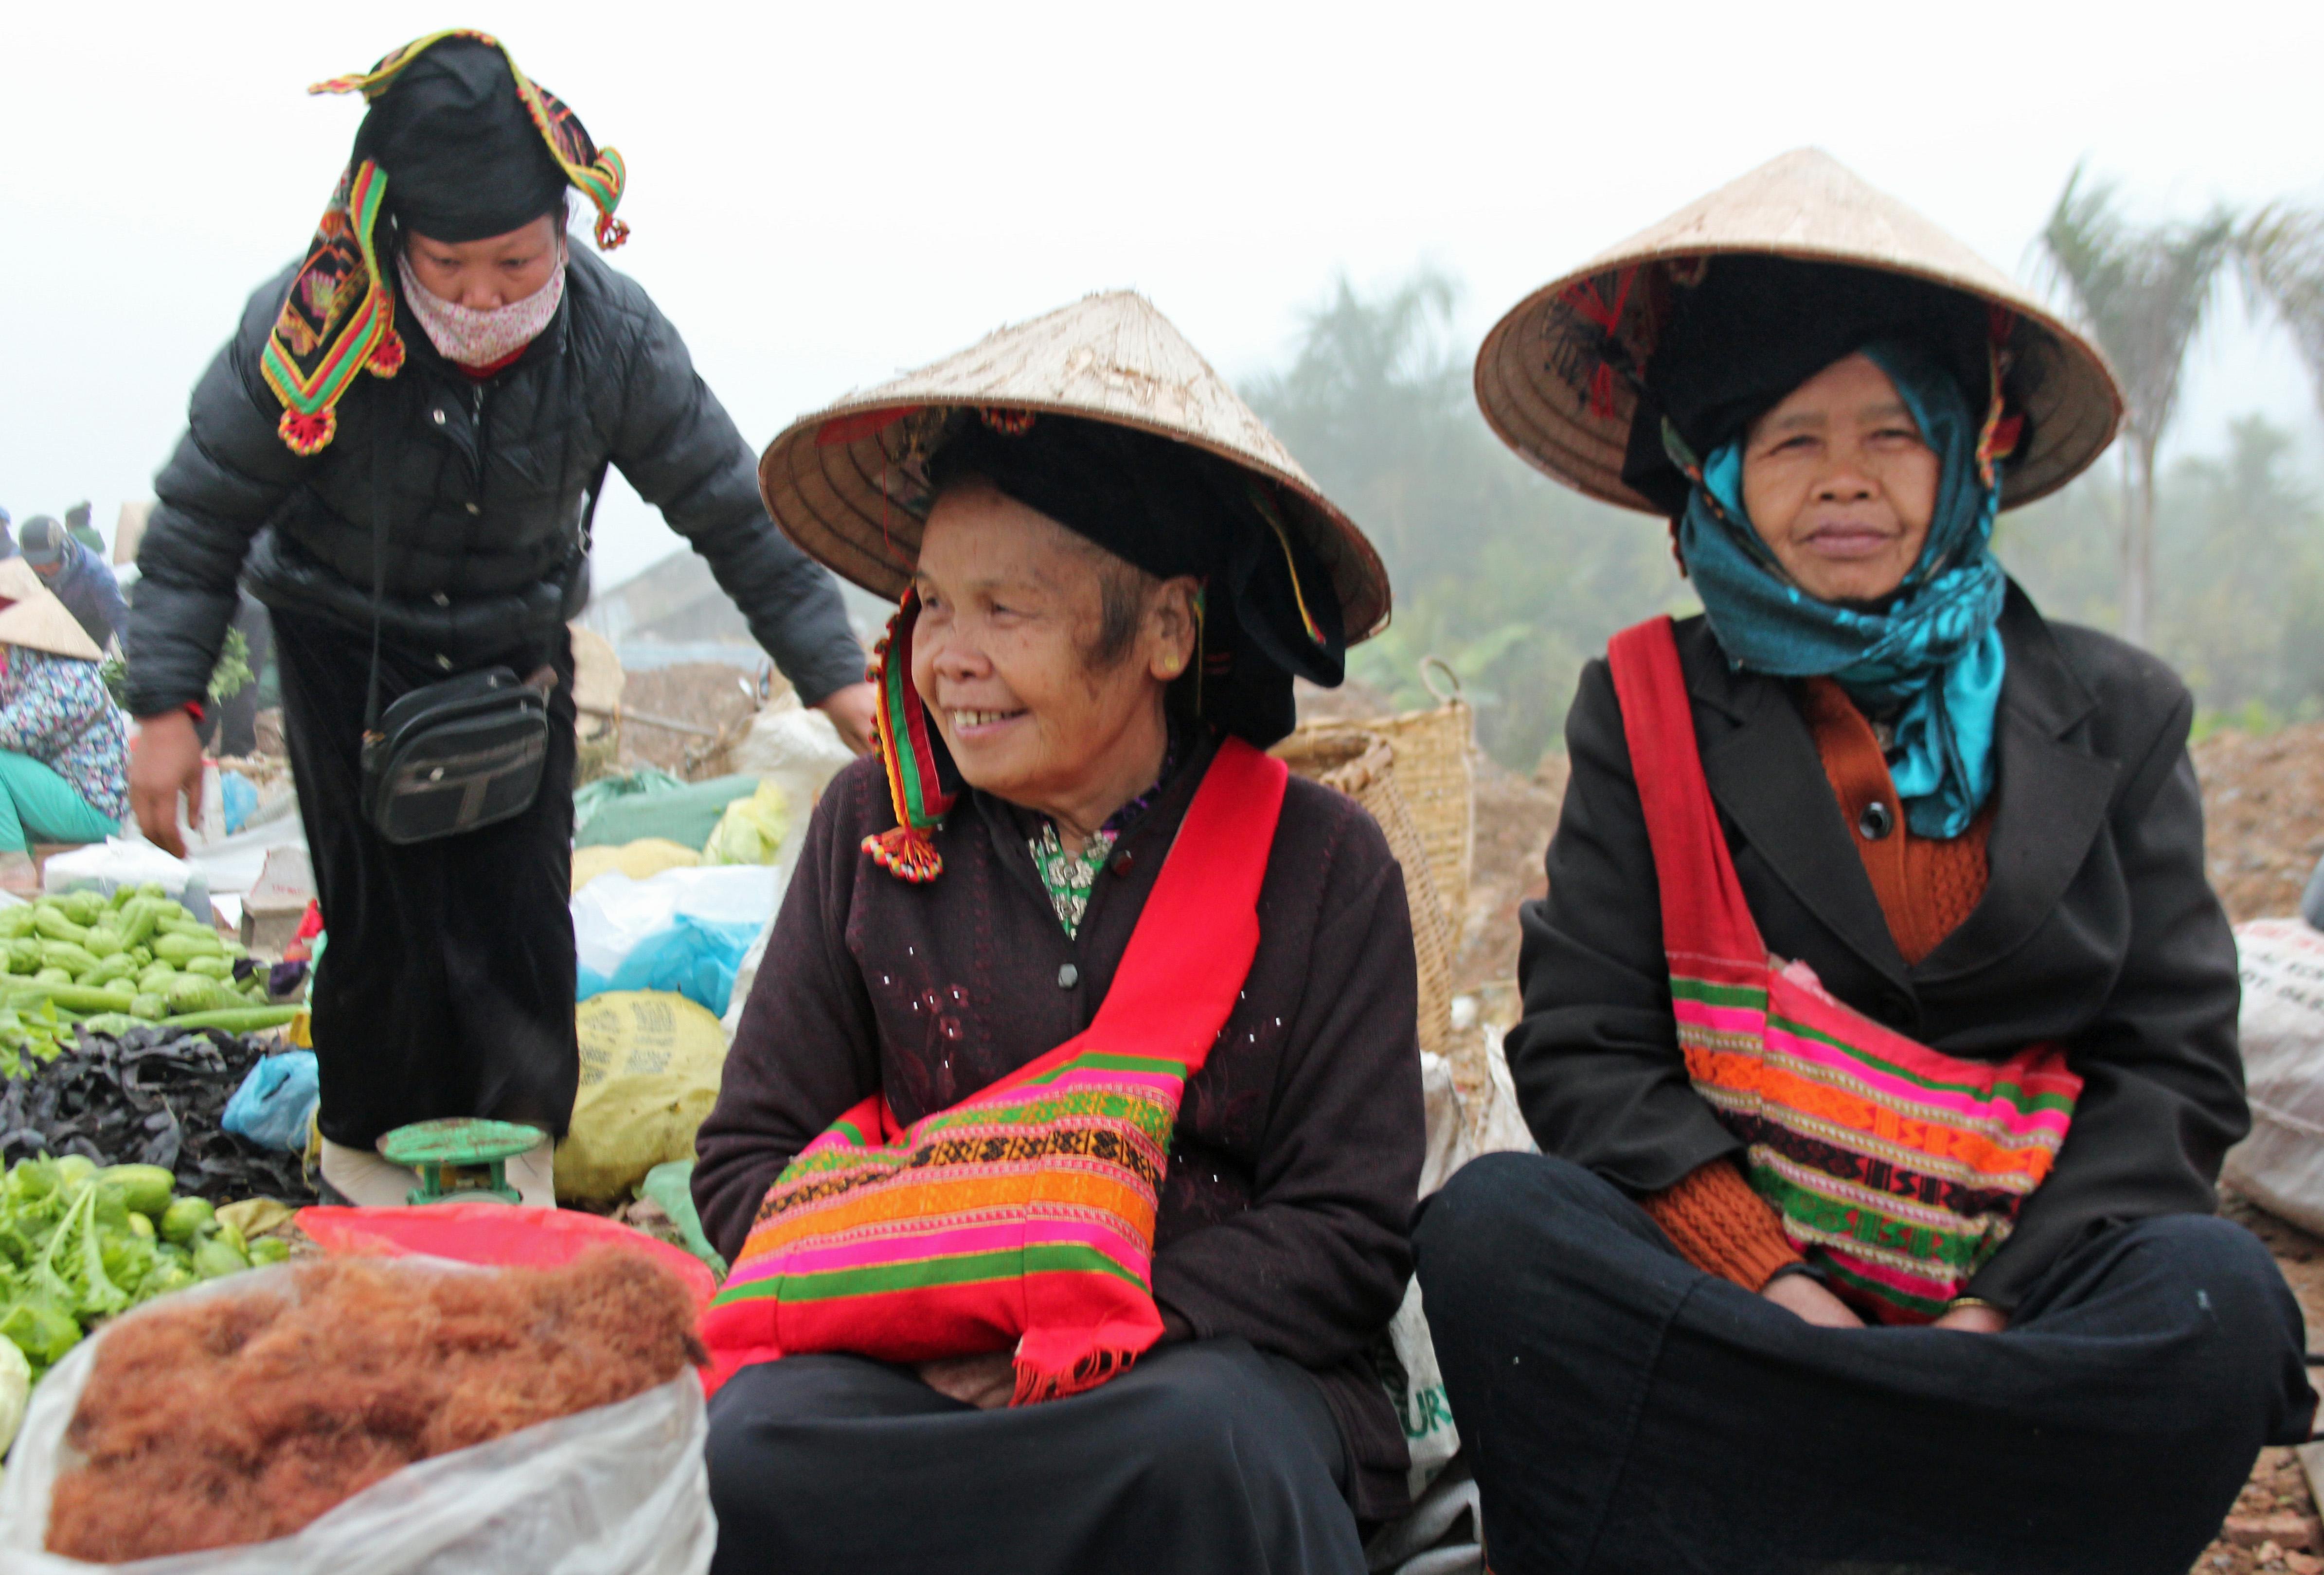 Dien Bien Phu Province in northwestern Vietnam is 80 percent ethnic minorities. Photo by Larisa Epatko/PBS NewsHour